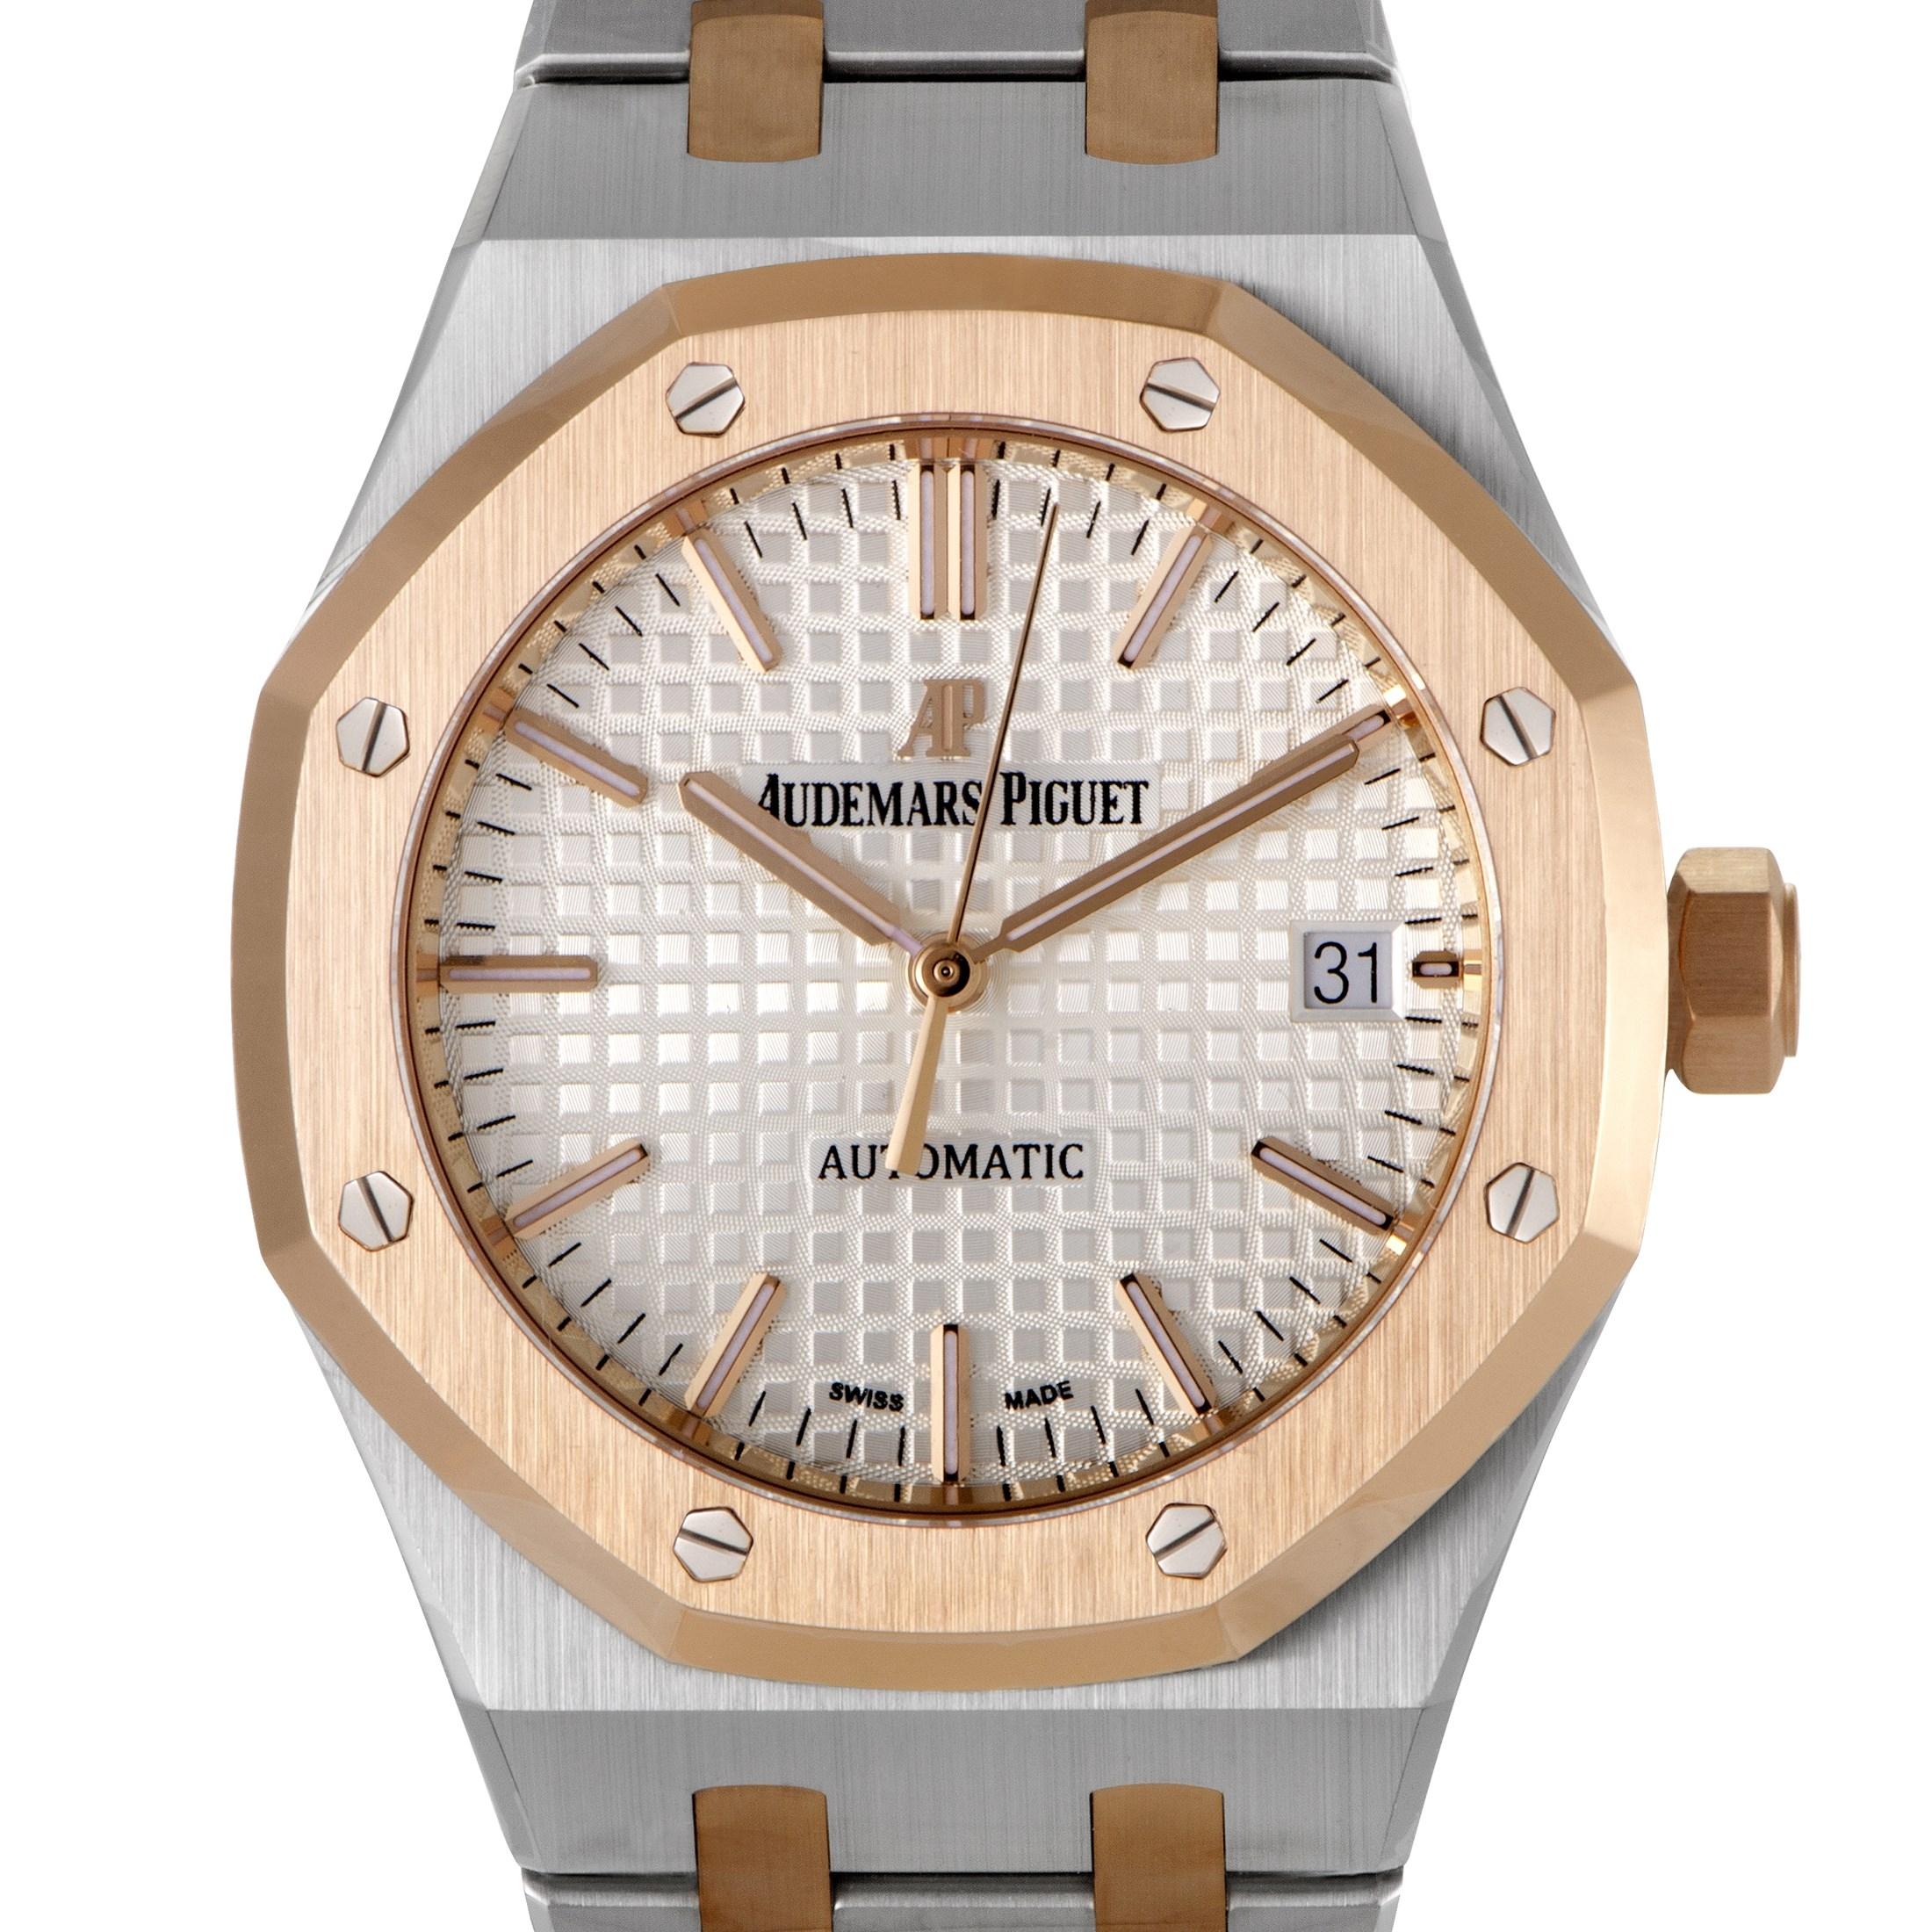 Royal Oak Womens Automatic Watch 15450SR.OO.1256SR.01